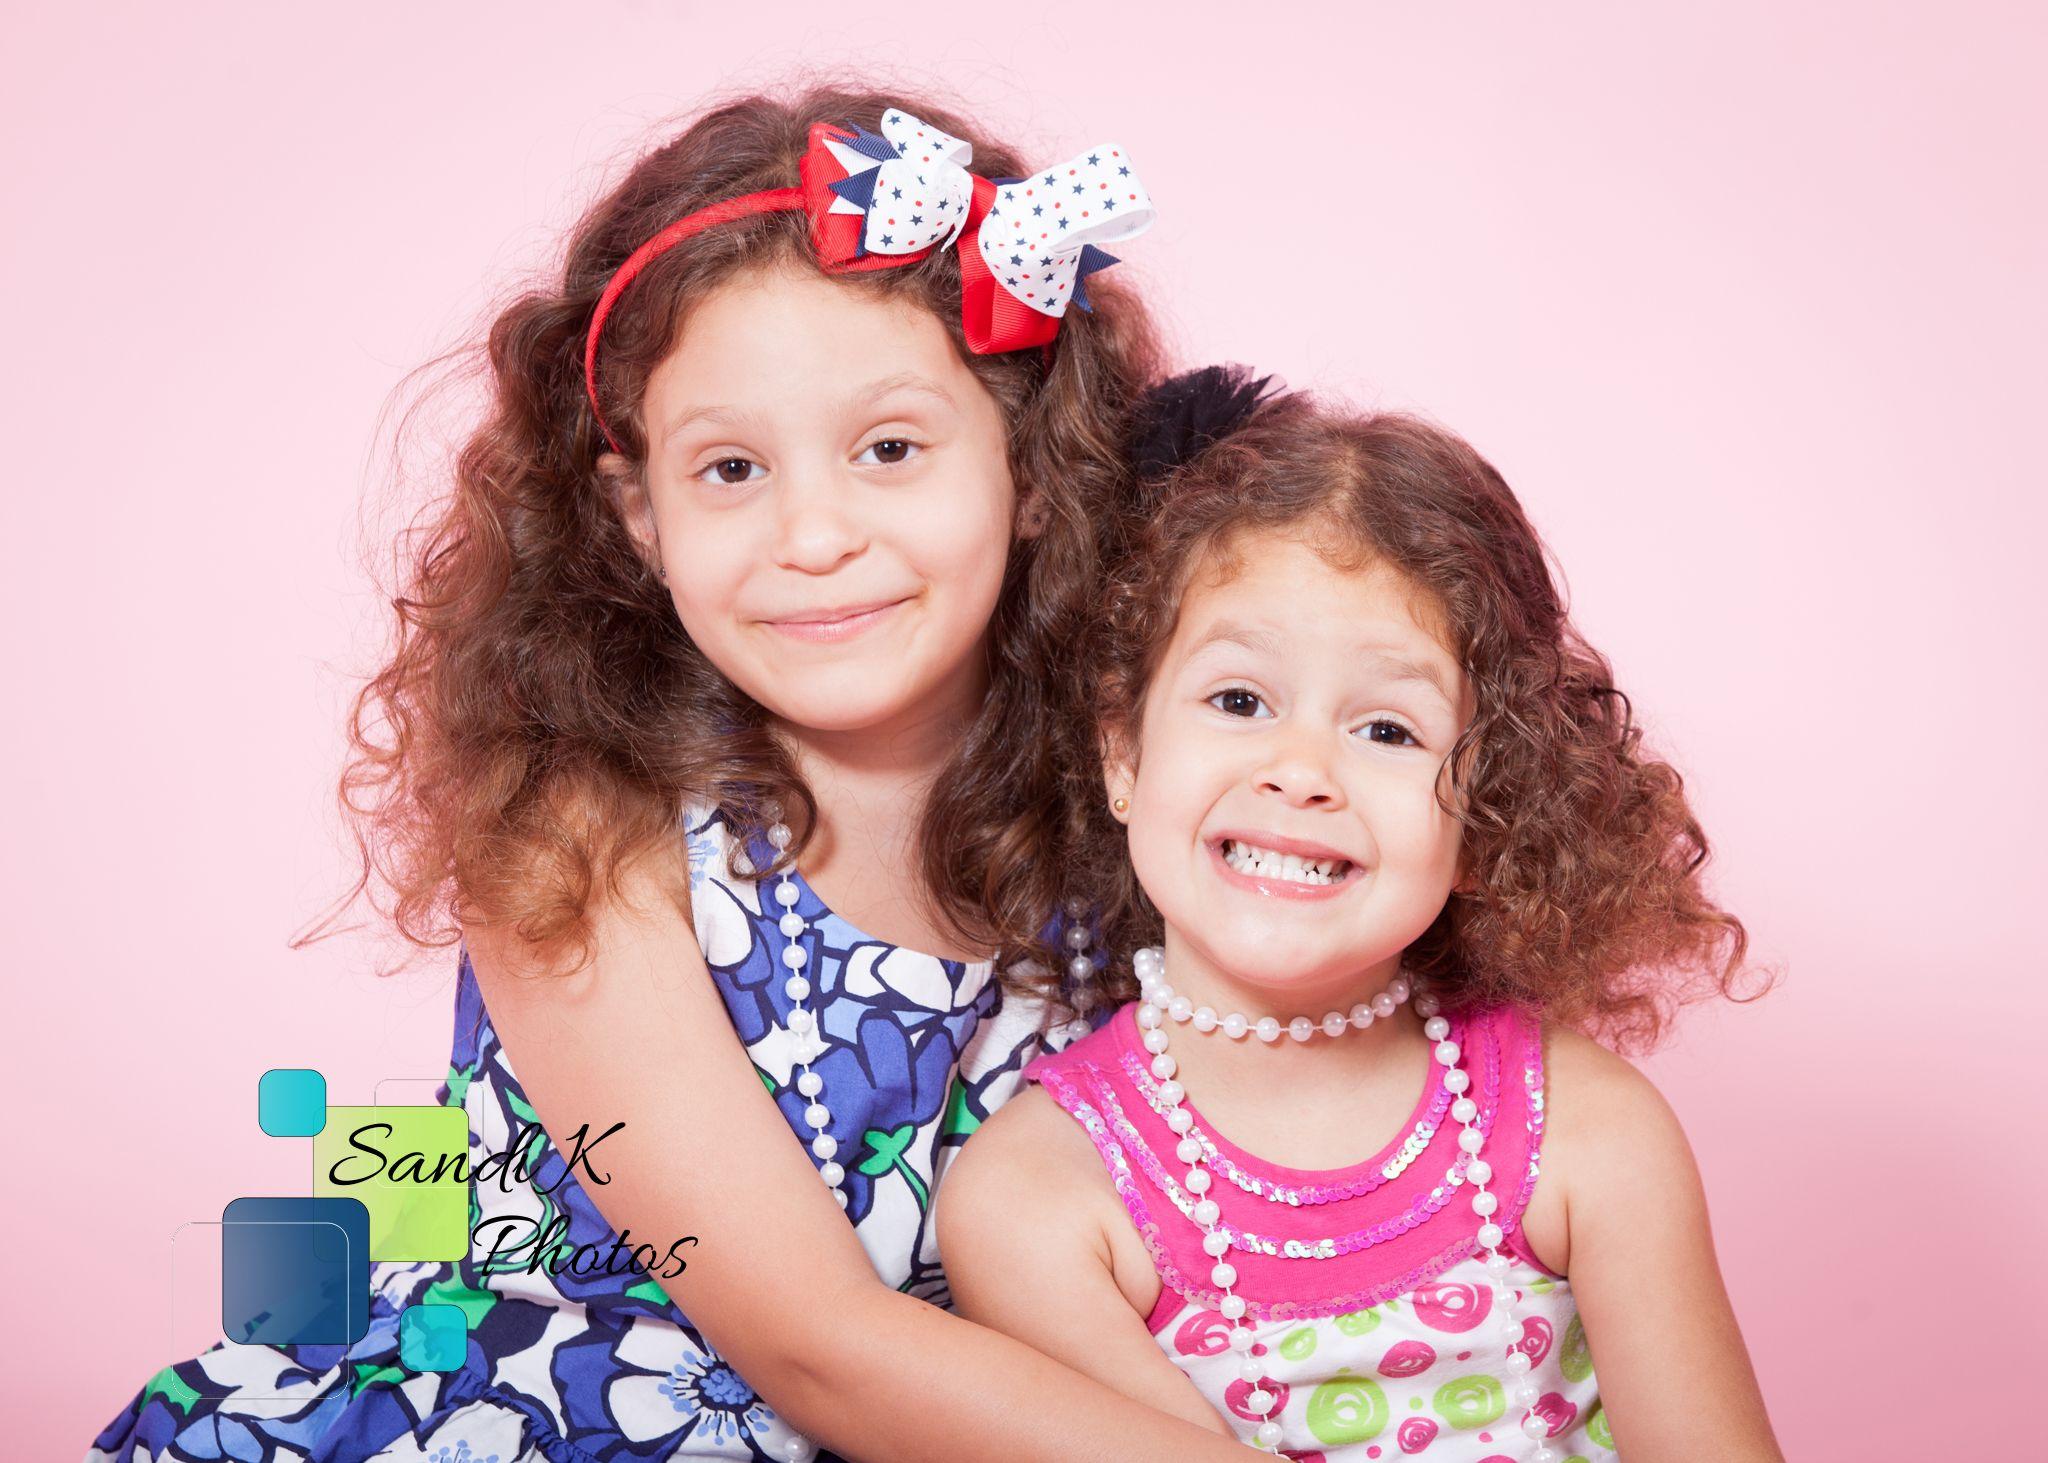 children photographer, child photographer, kids photos, scranton photographer, moscow photographer